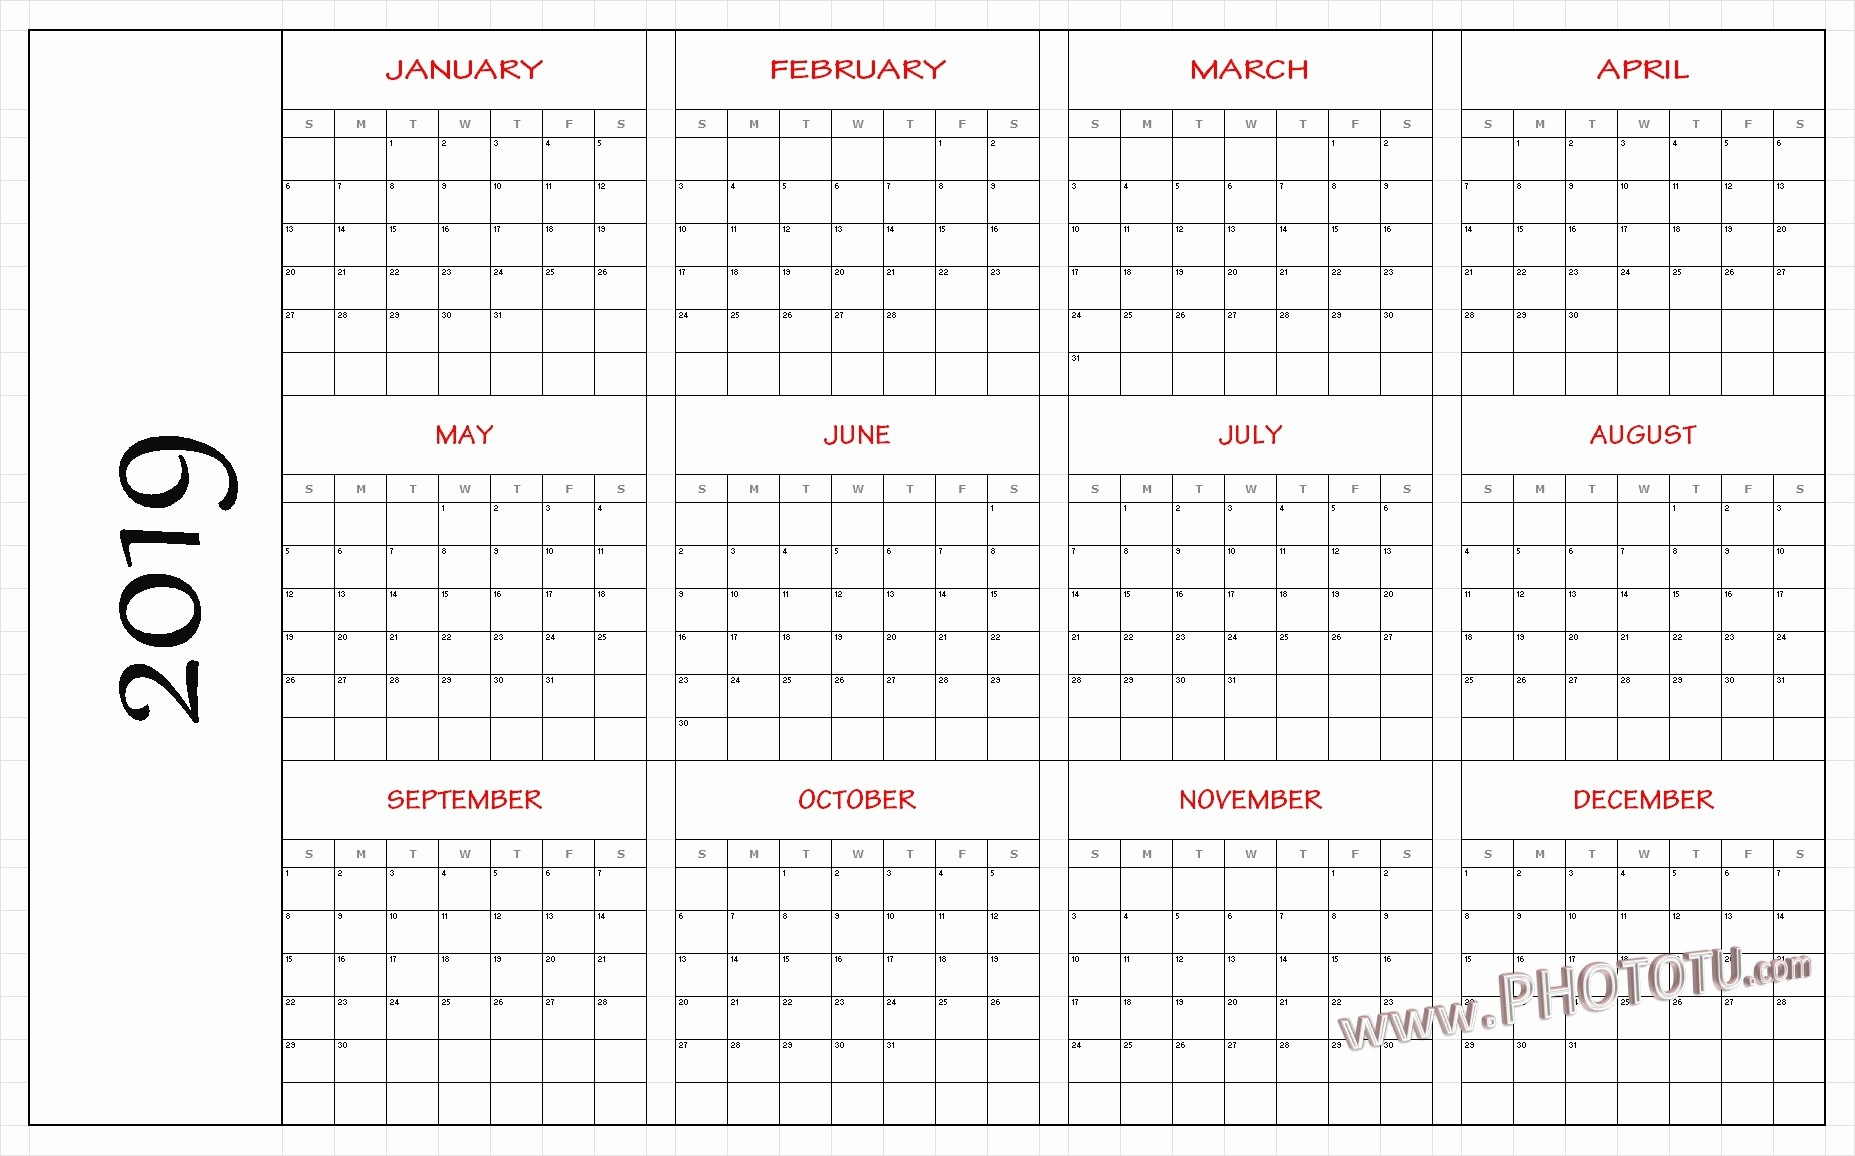 Printable 12 Month Calendar 2019 Awesome Monthly 2019 Holidays Calendar Templates